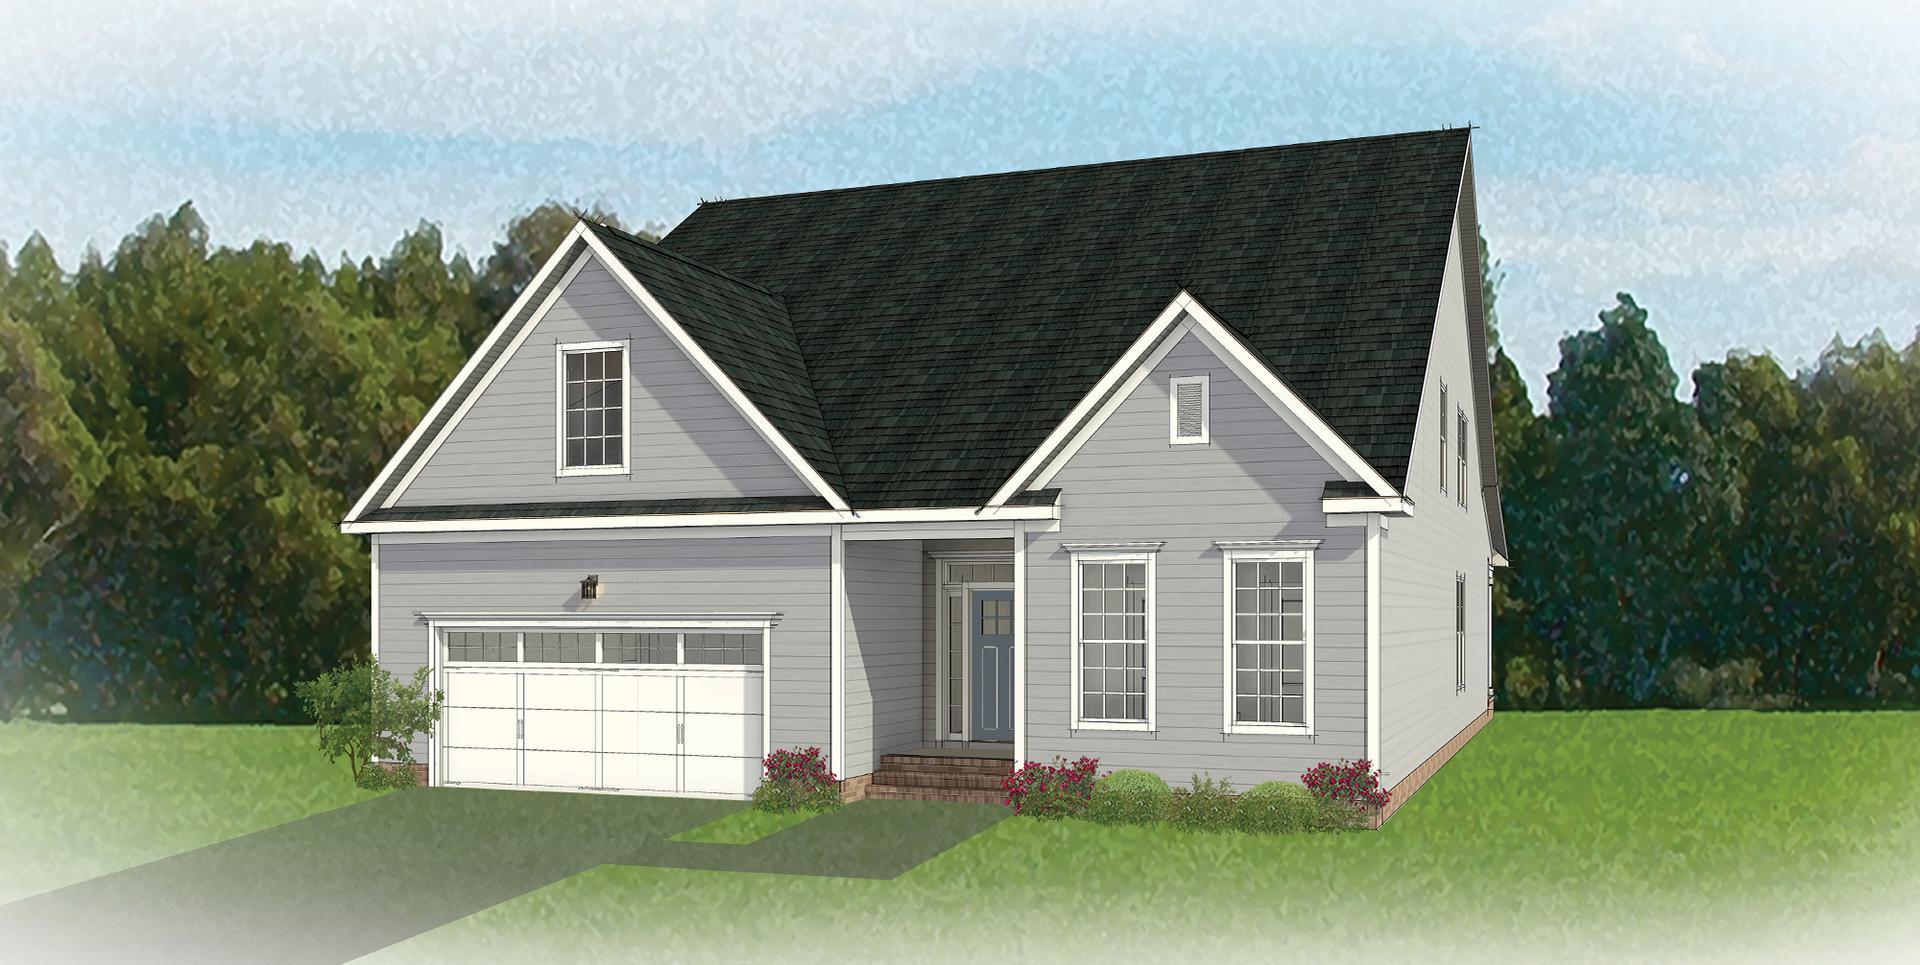 The Fulton New Home Floorplan